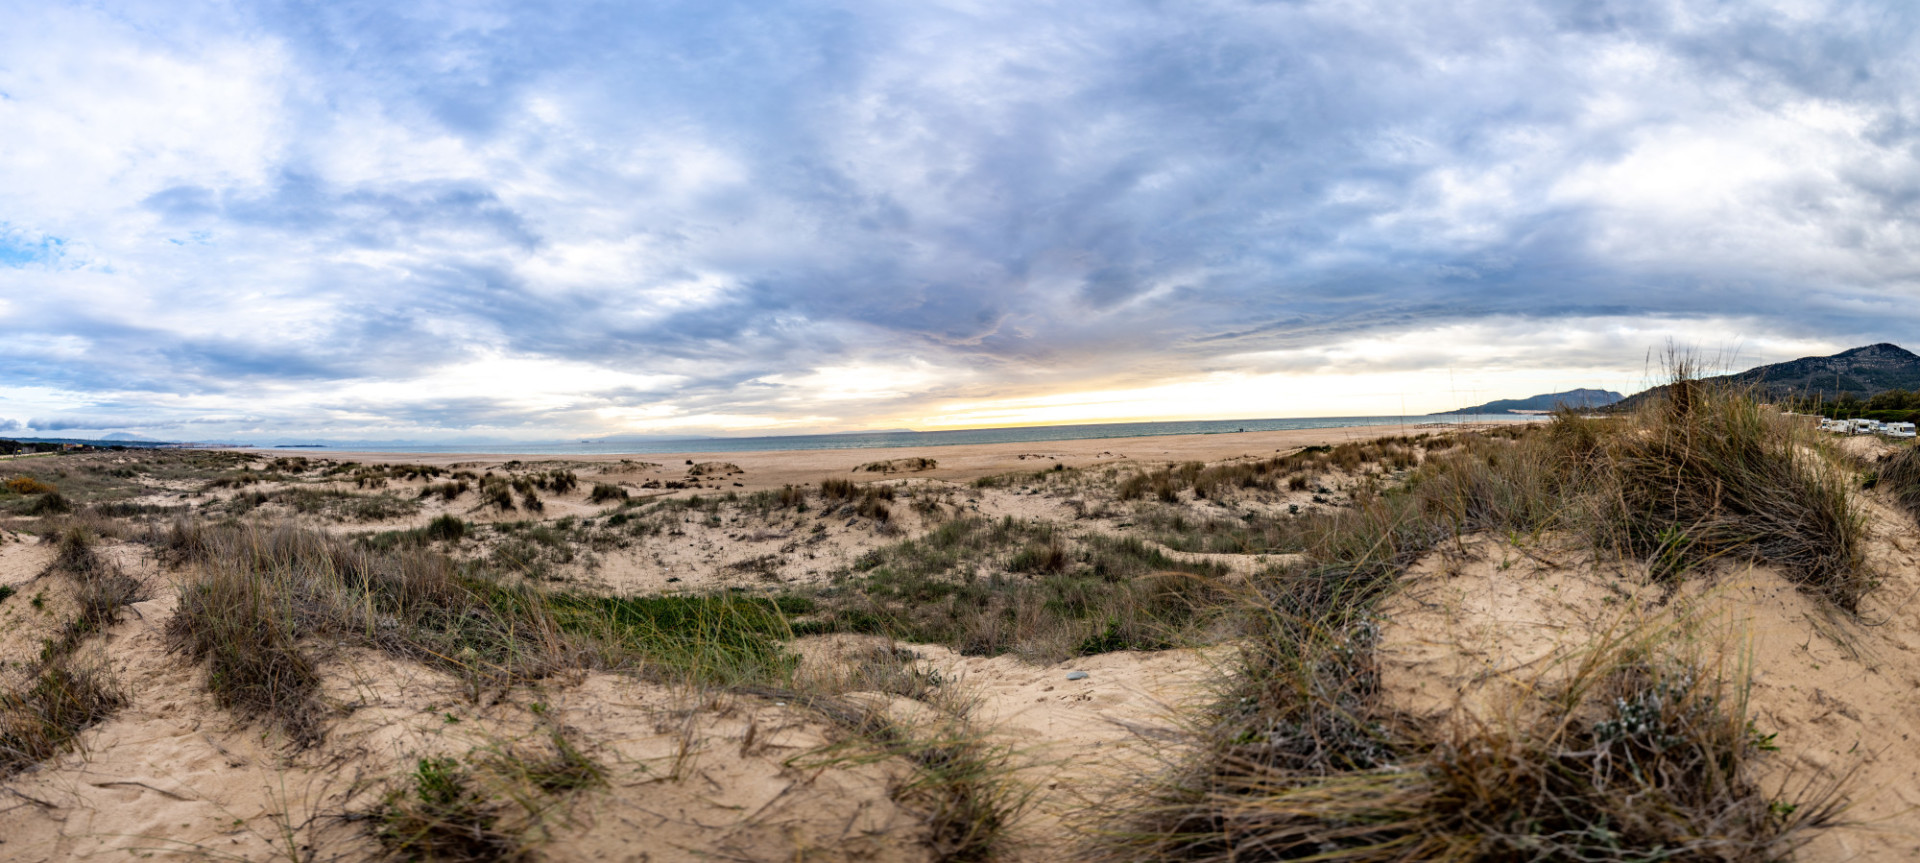 Playa de los Lances Landscape Panorama